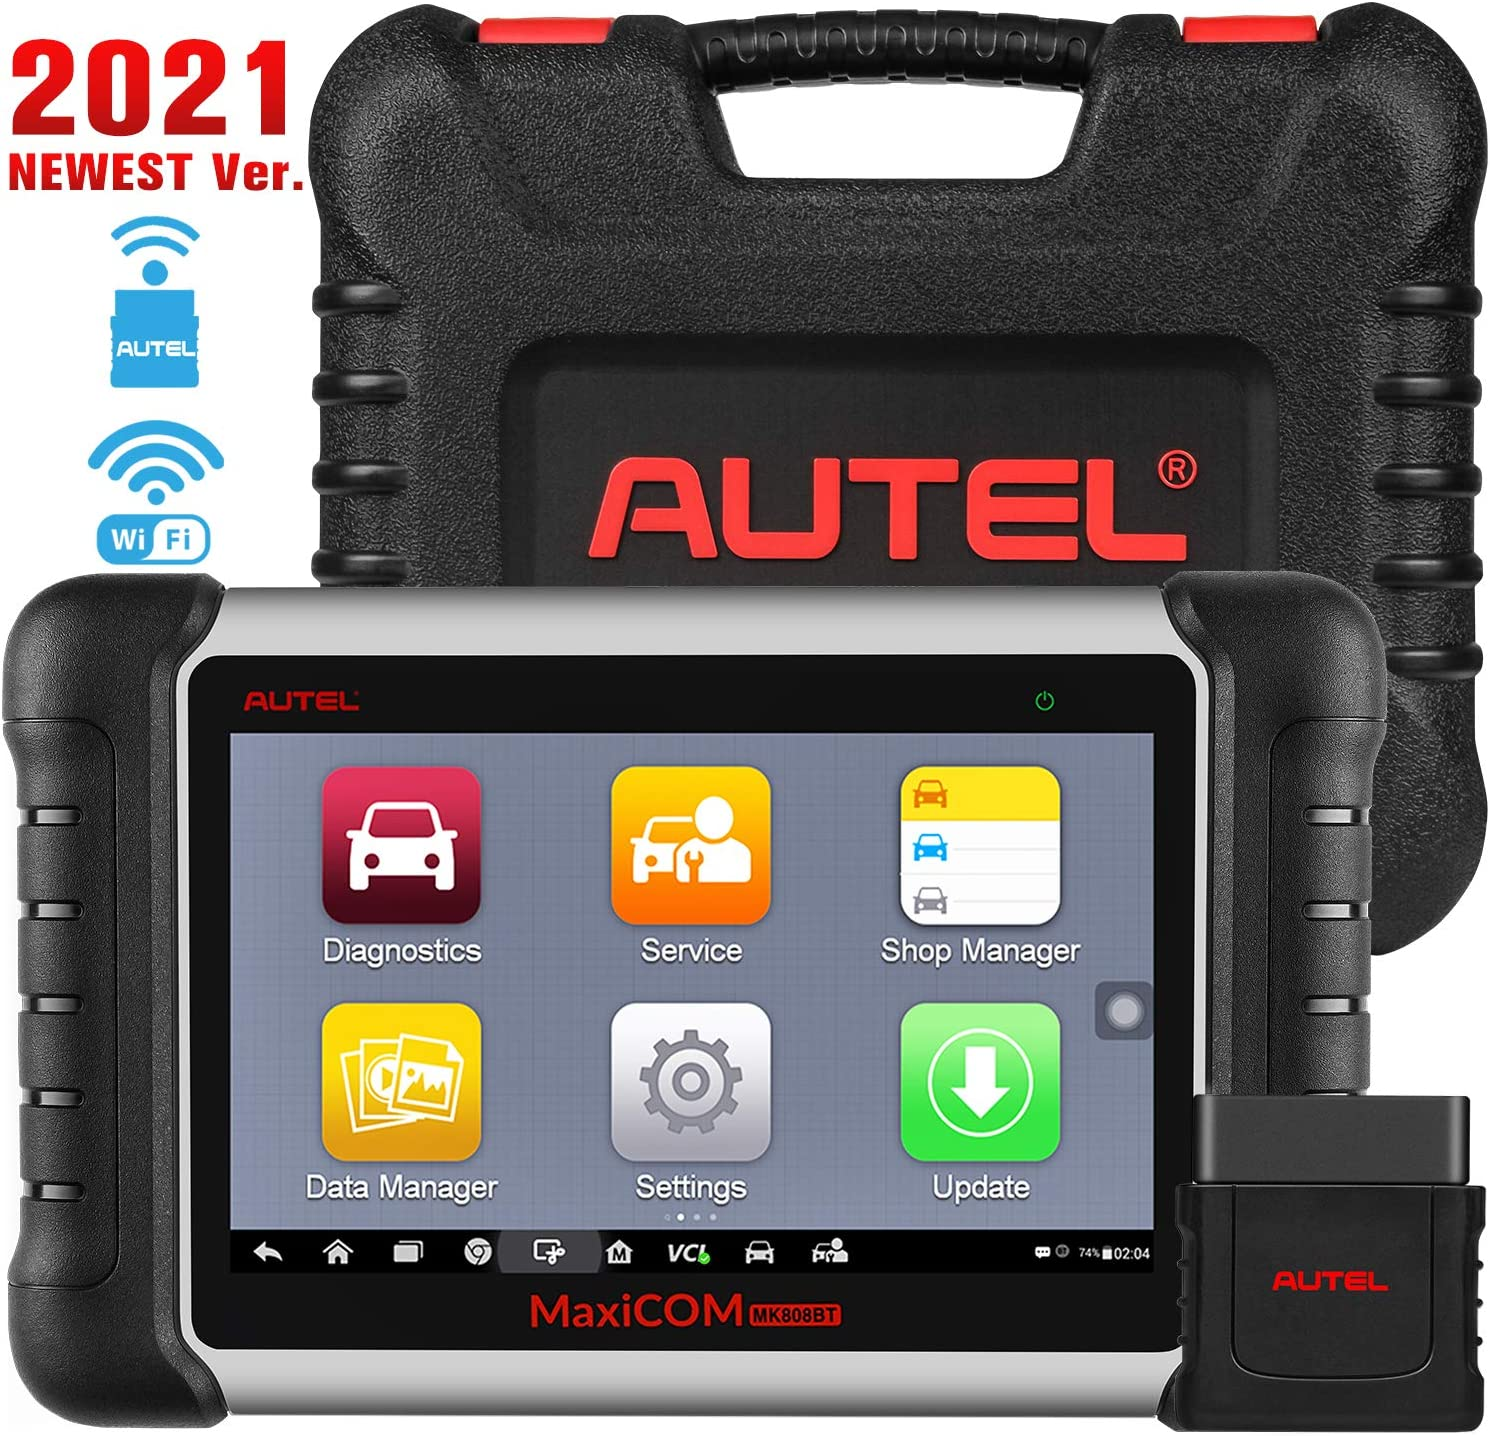 Autel Obd2 Diagnostic Tool Obd2 Scanner M Auto